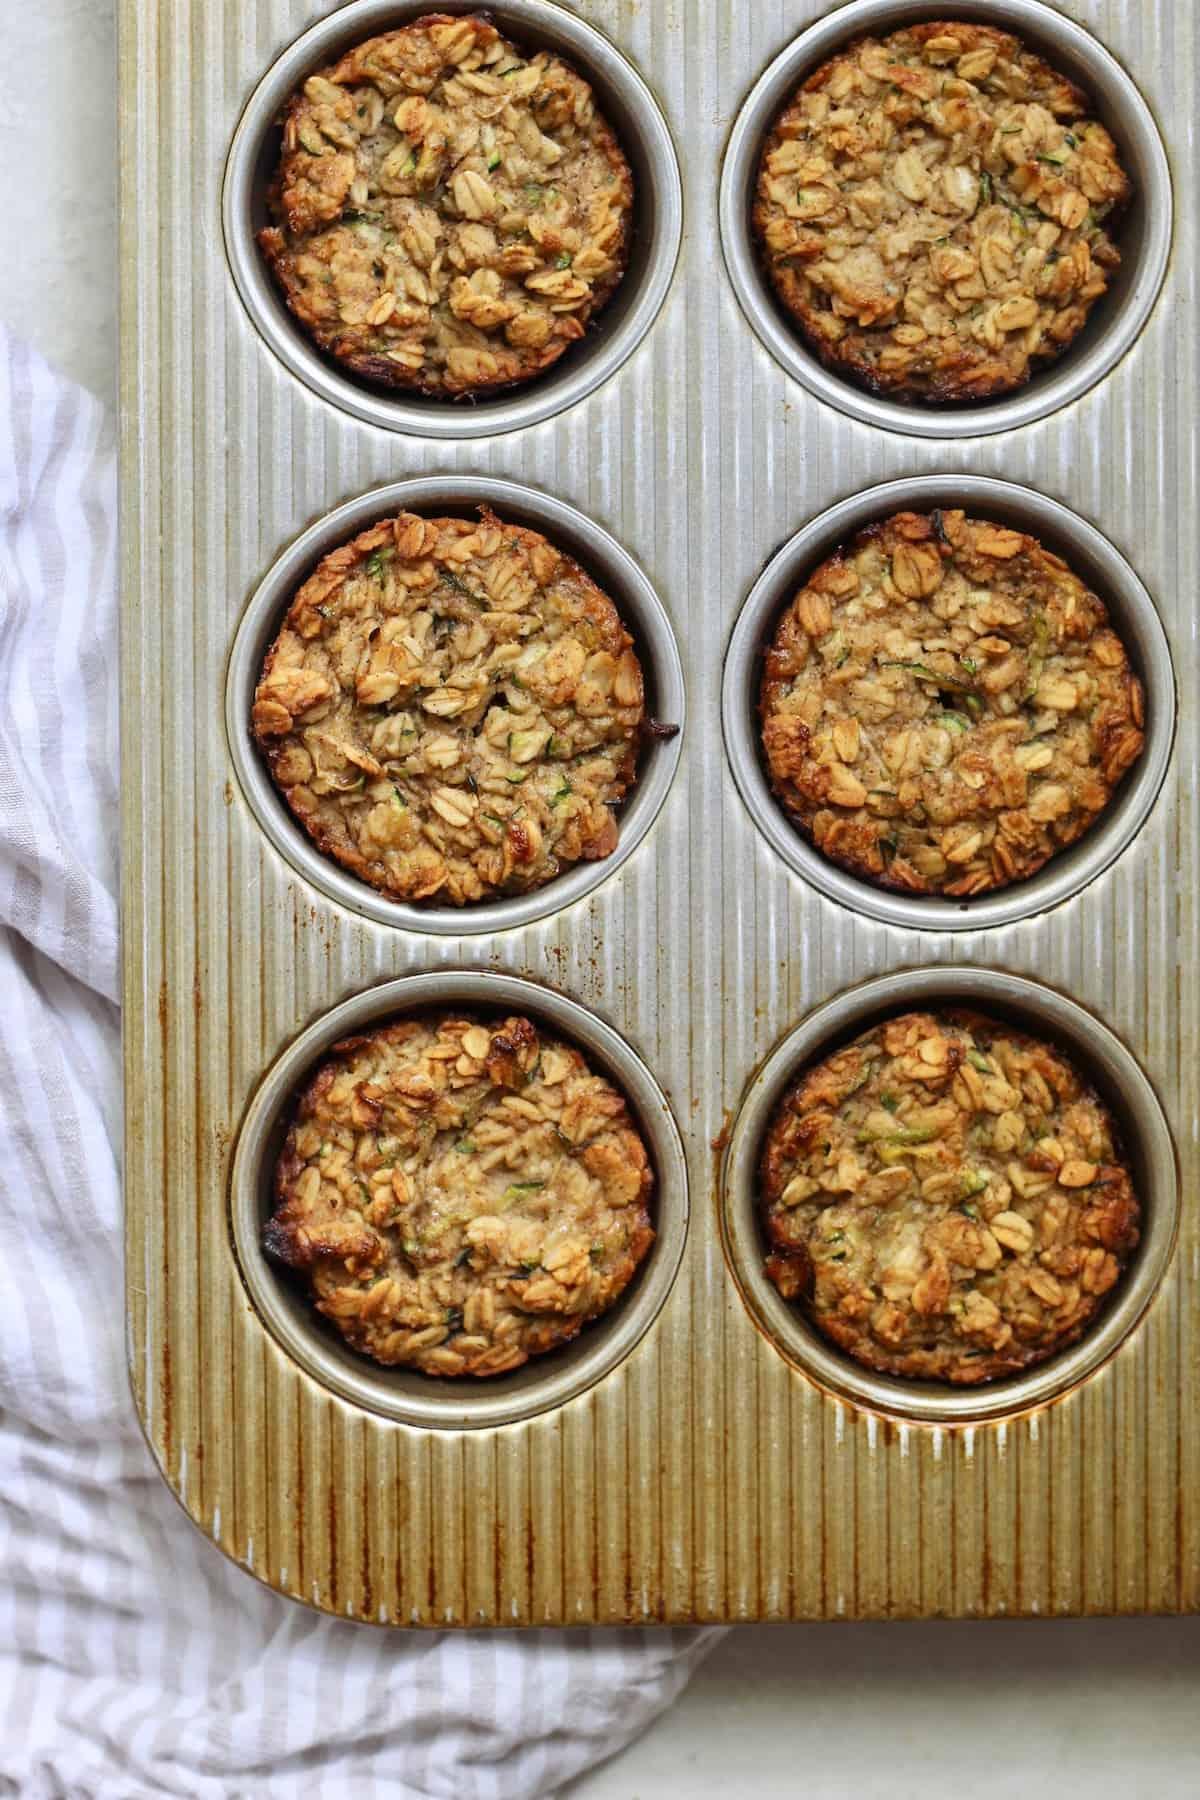 muffin tin of oatmeal cups